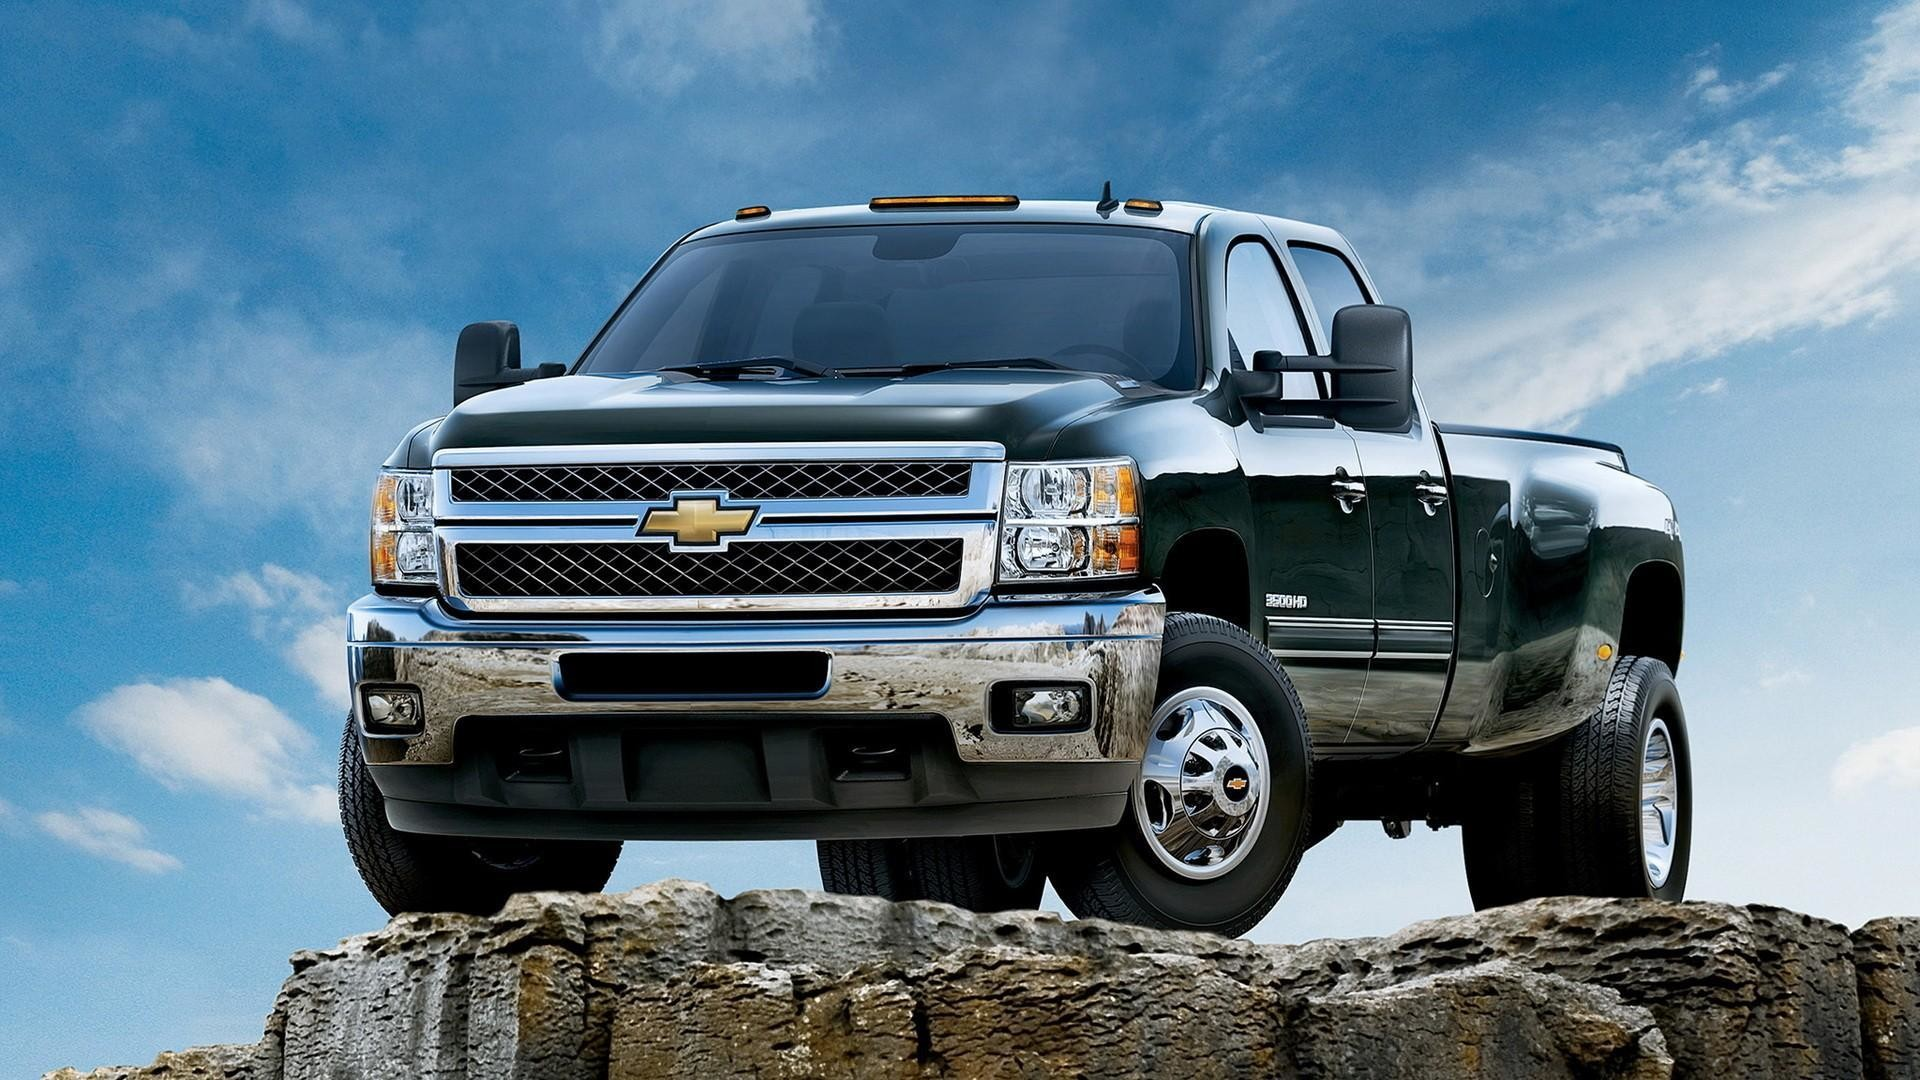 Lifted Chevy Truck Wallpaper – WallpaperSafari